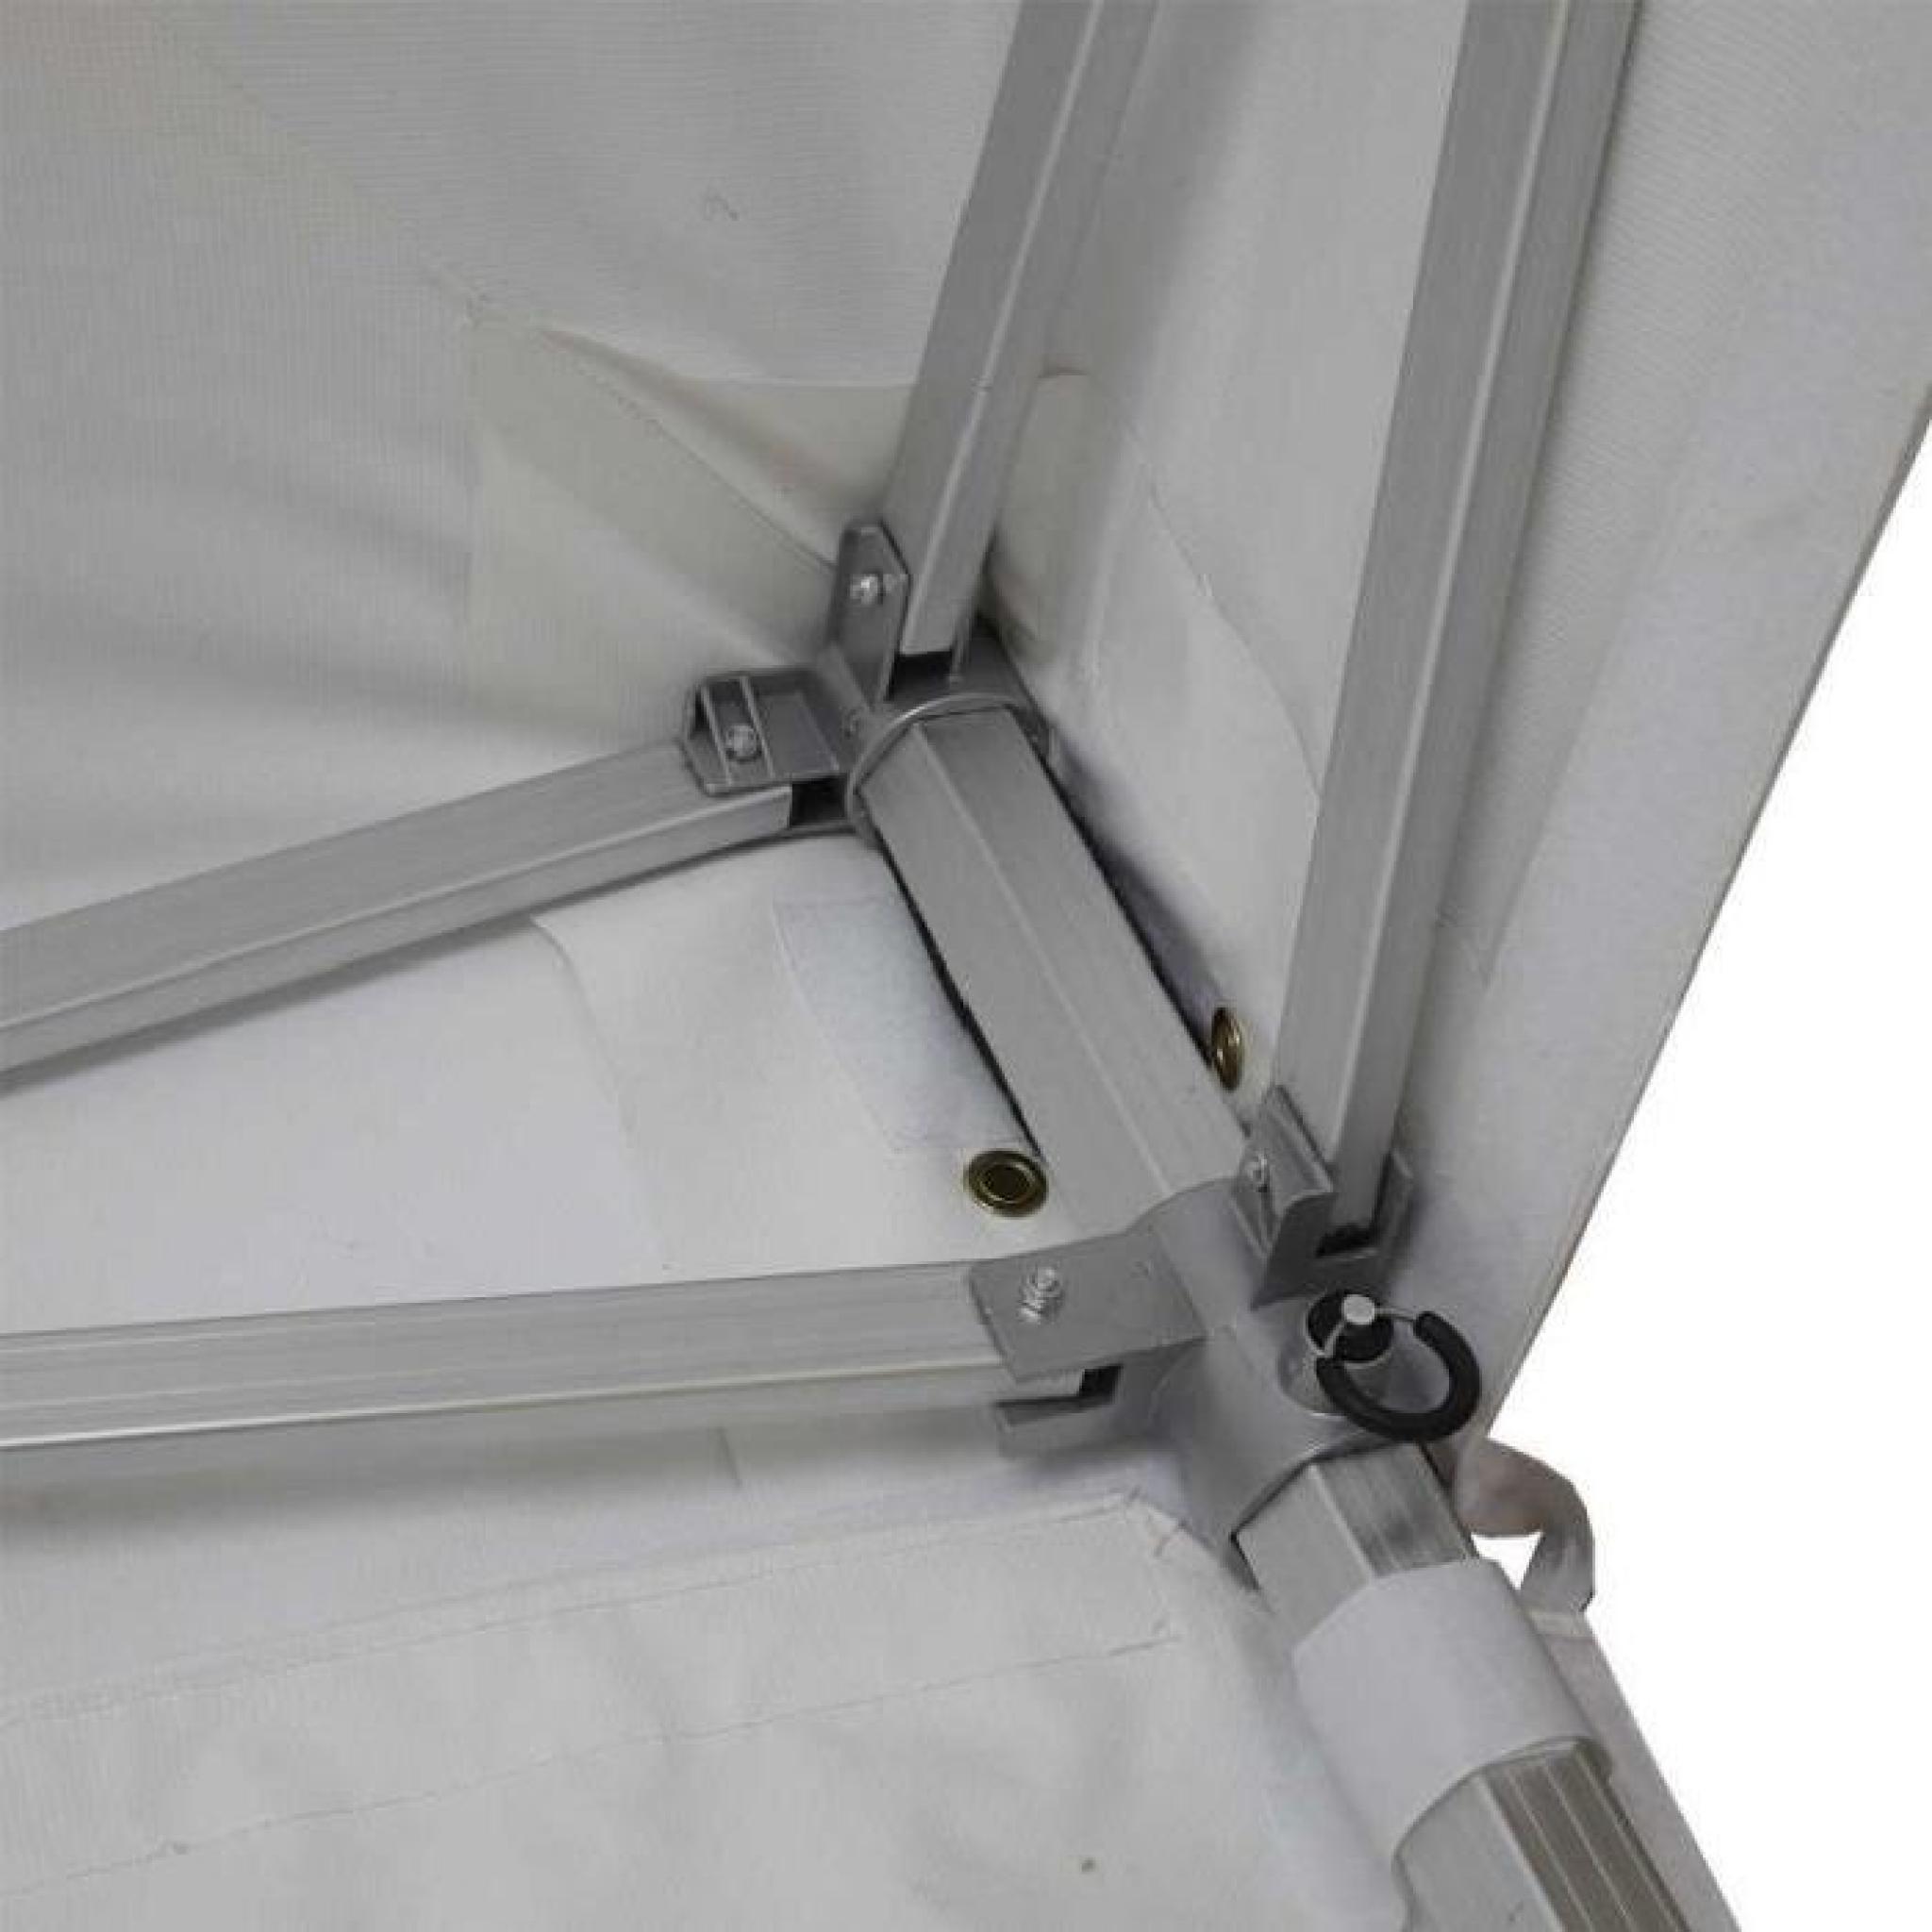 tente pliante pro 3x3 m anti feu barnum pliable achat vente pergola en aluminium pas cher. Black Bedroom Furniture Sets. Home Design Ideas